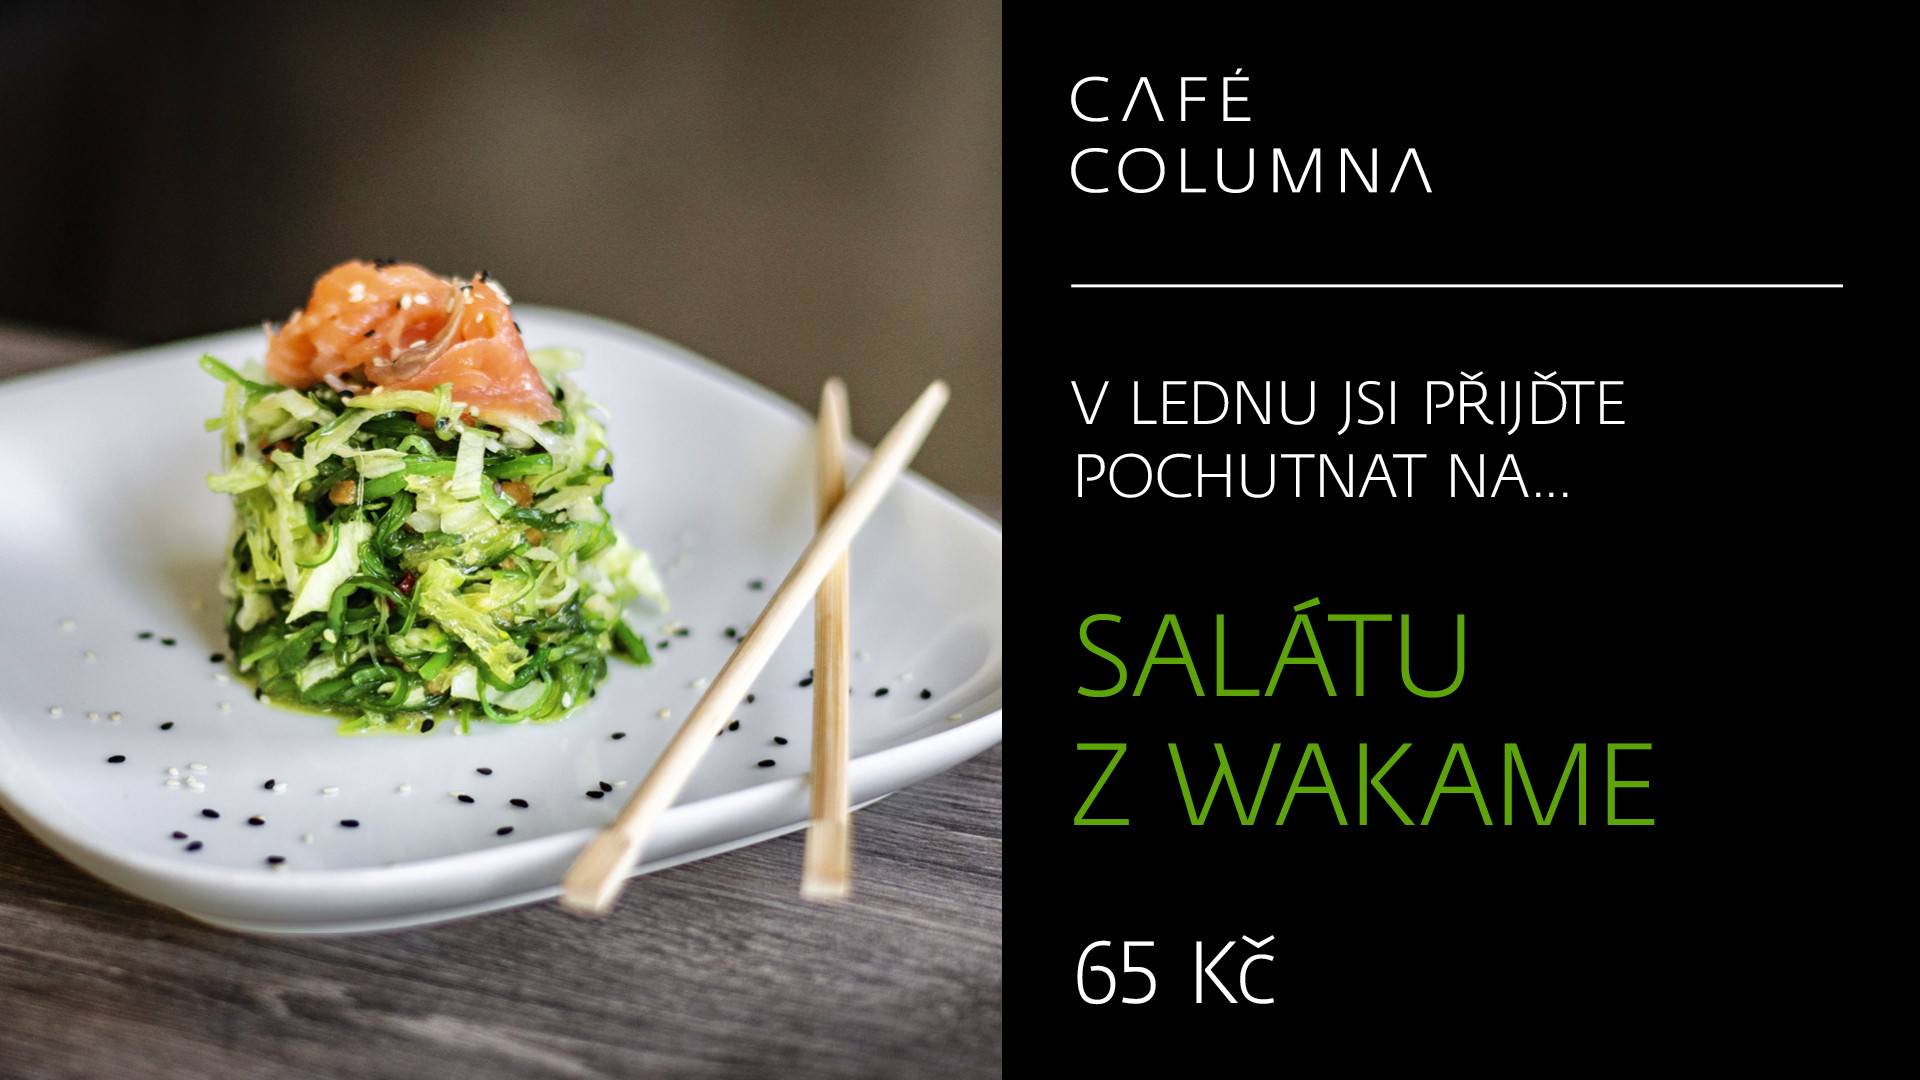 Café_Columna_LCD_1920x1080px_Wakame_salat_2019